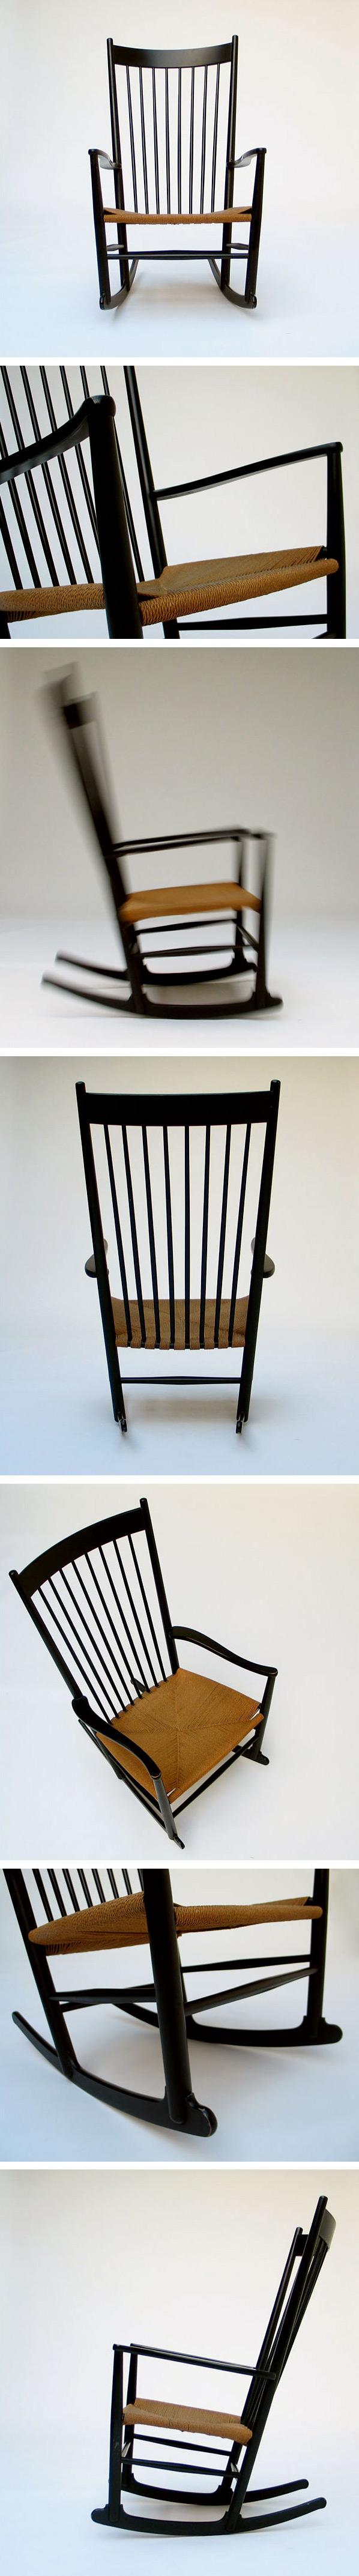 Hans J. Wegner Rocking Chair J16 FDB Mobler Large